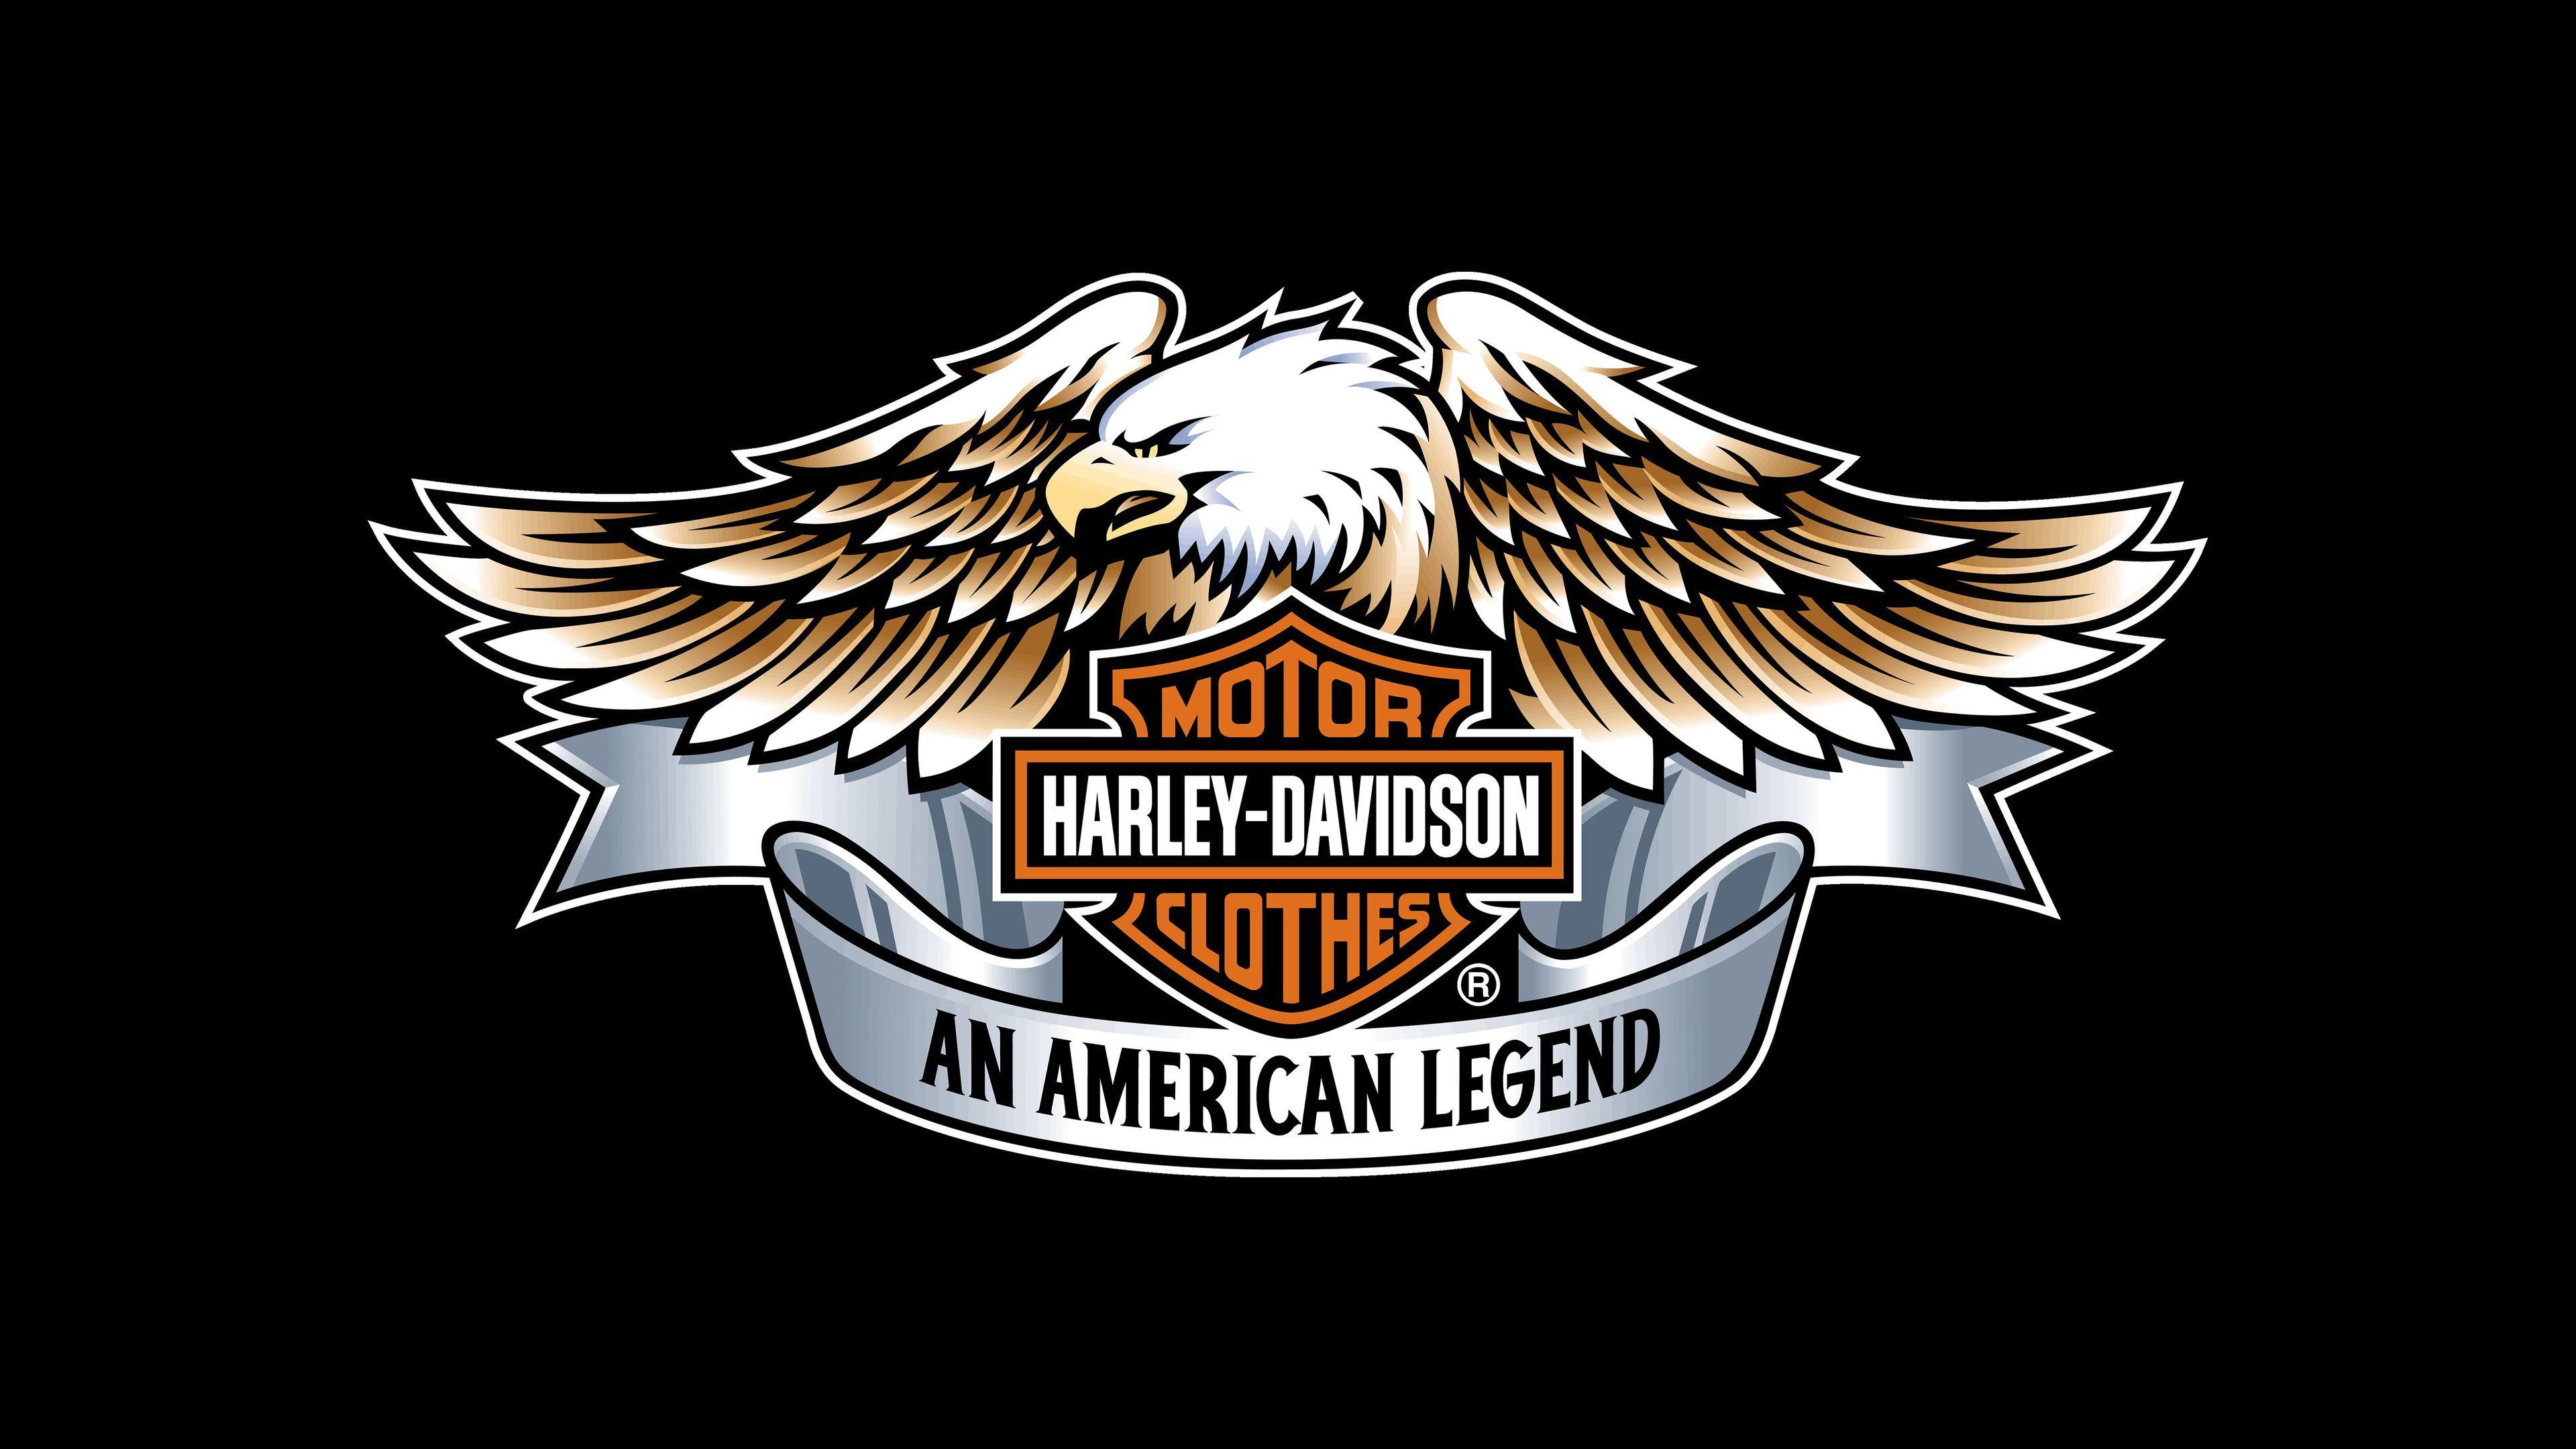 Wallpaper 4k Harley Davidson Eagle Logo 4k 4k Wallpapers 5k Wallpapers Bikes Wallpapers Eagle Wallpapers Harley Davidson Wallpapers Hd Wallpapers Logo Wal Kurt